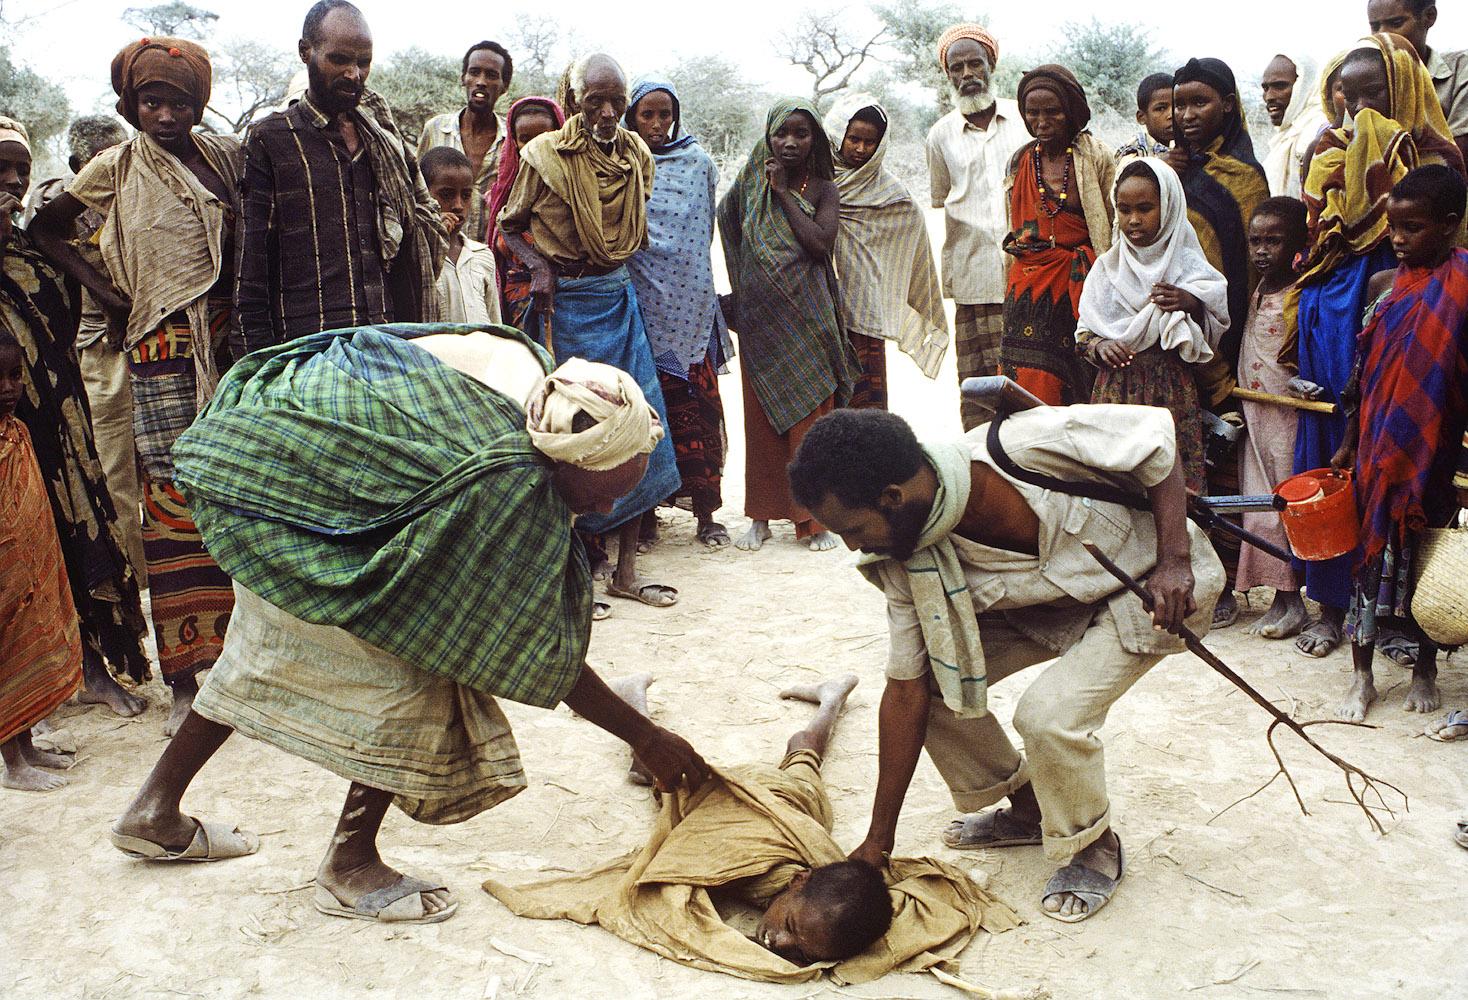 Somalia_Famine_4_PRINT: Somalia: Andrew Holbrooke Photography: andrewholbrooke.com/somalia/Somalia_Famine_4_PRINT